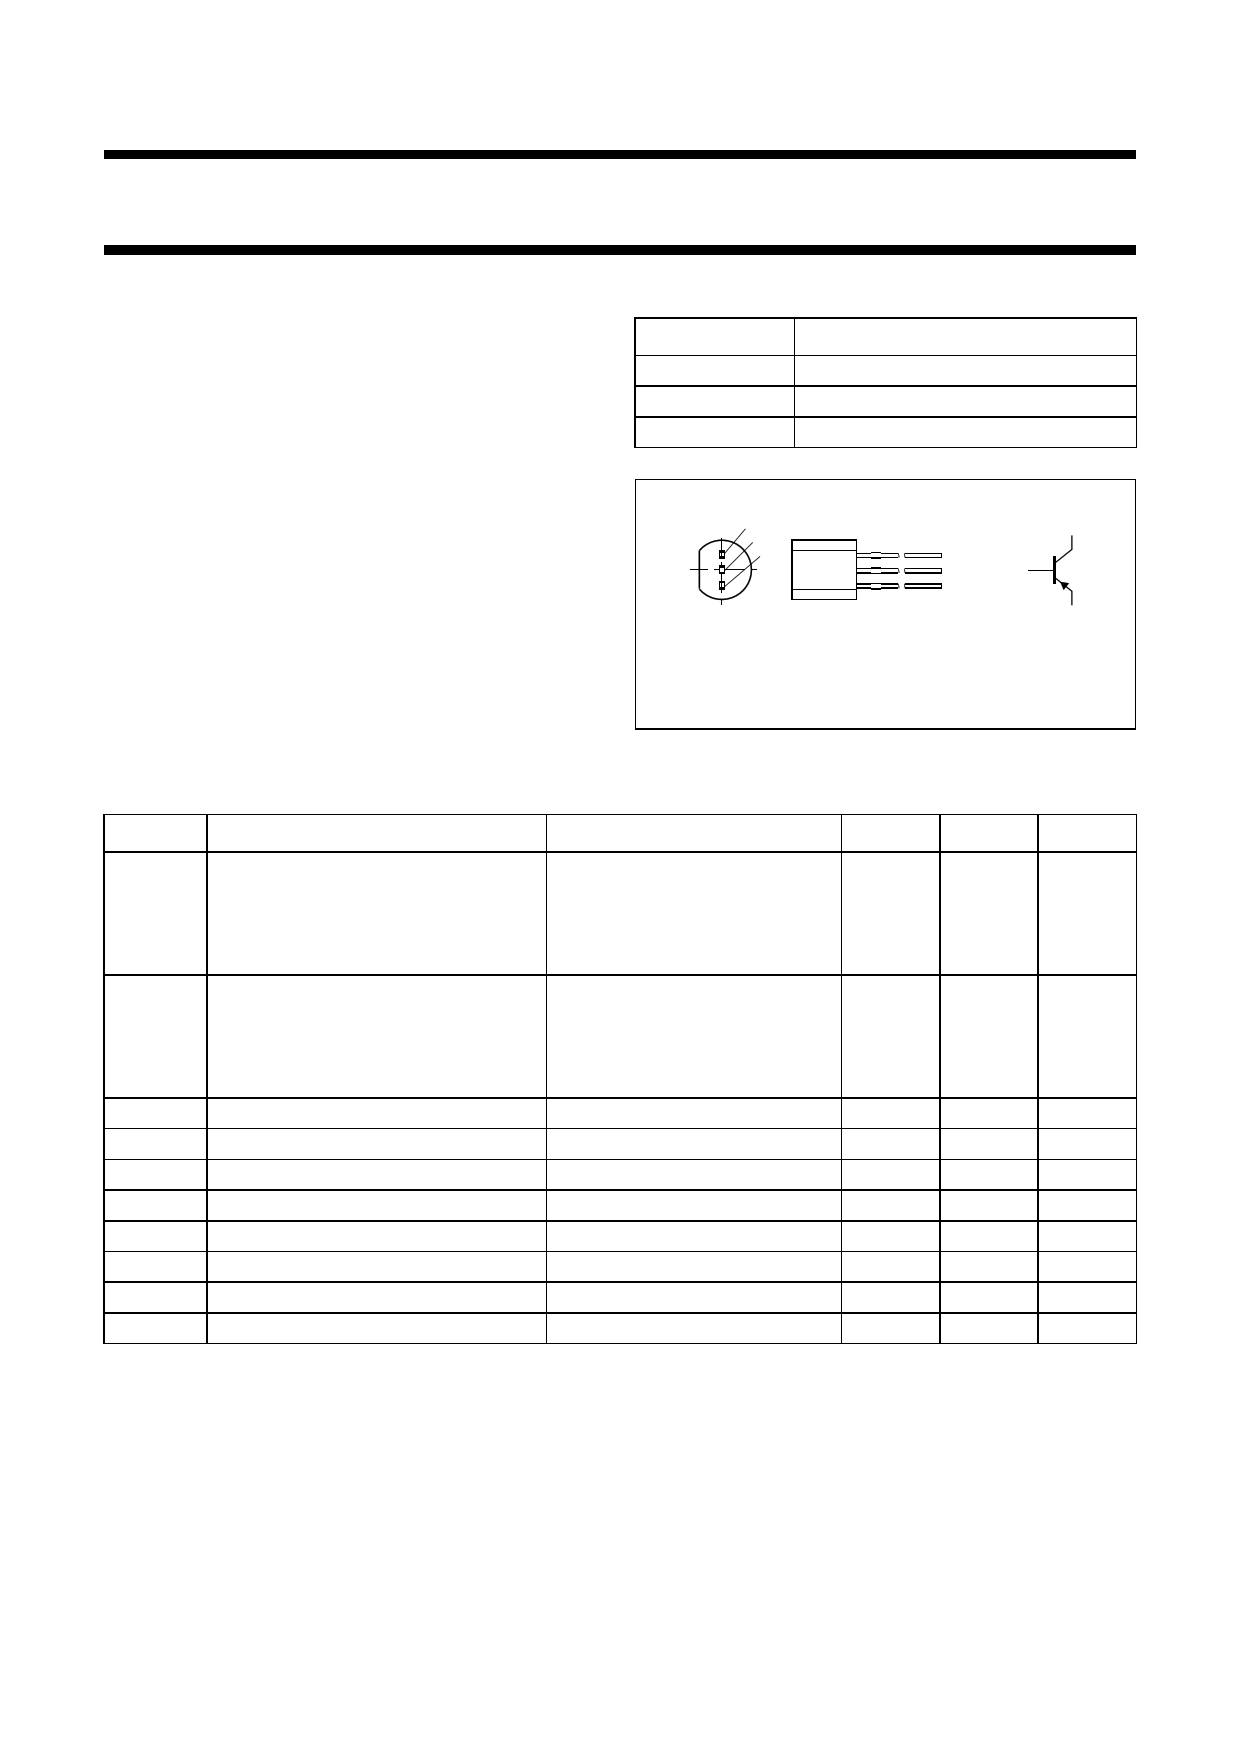 Bc639 datasheet